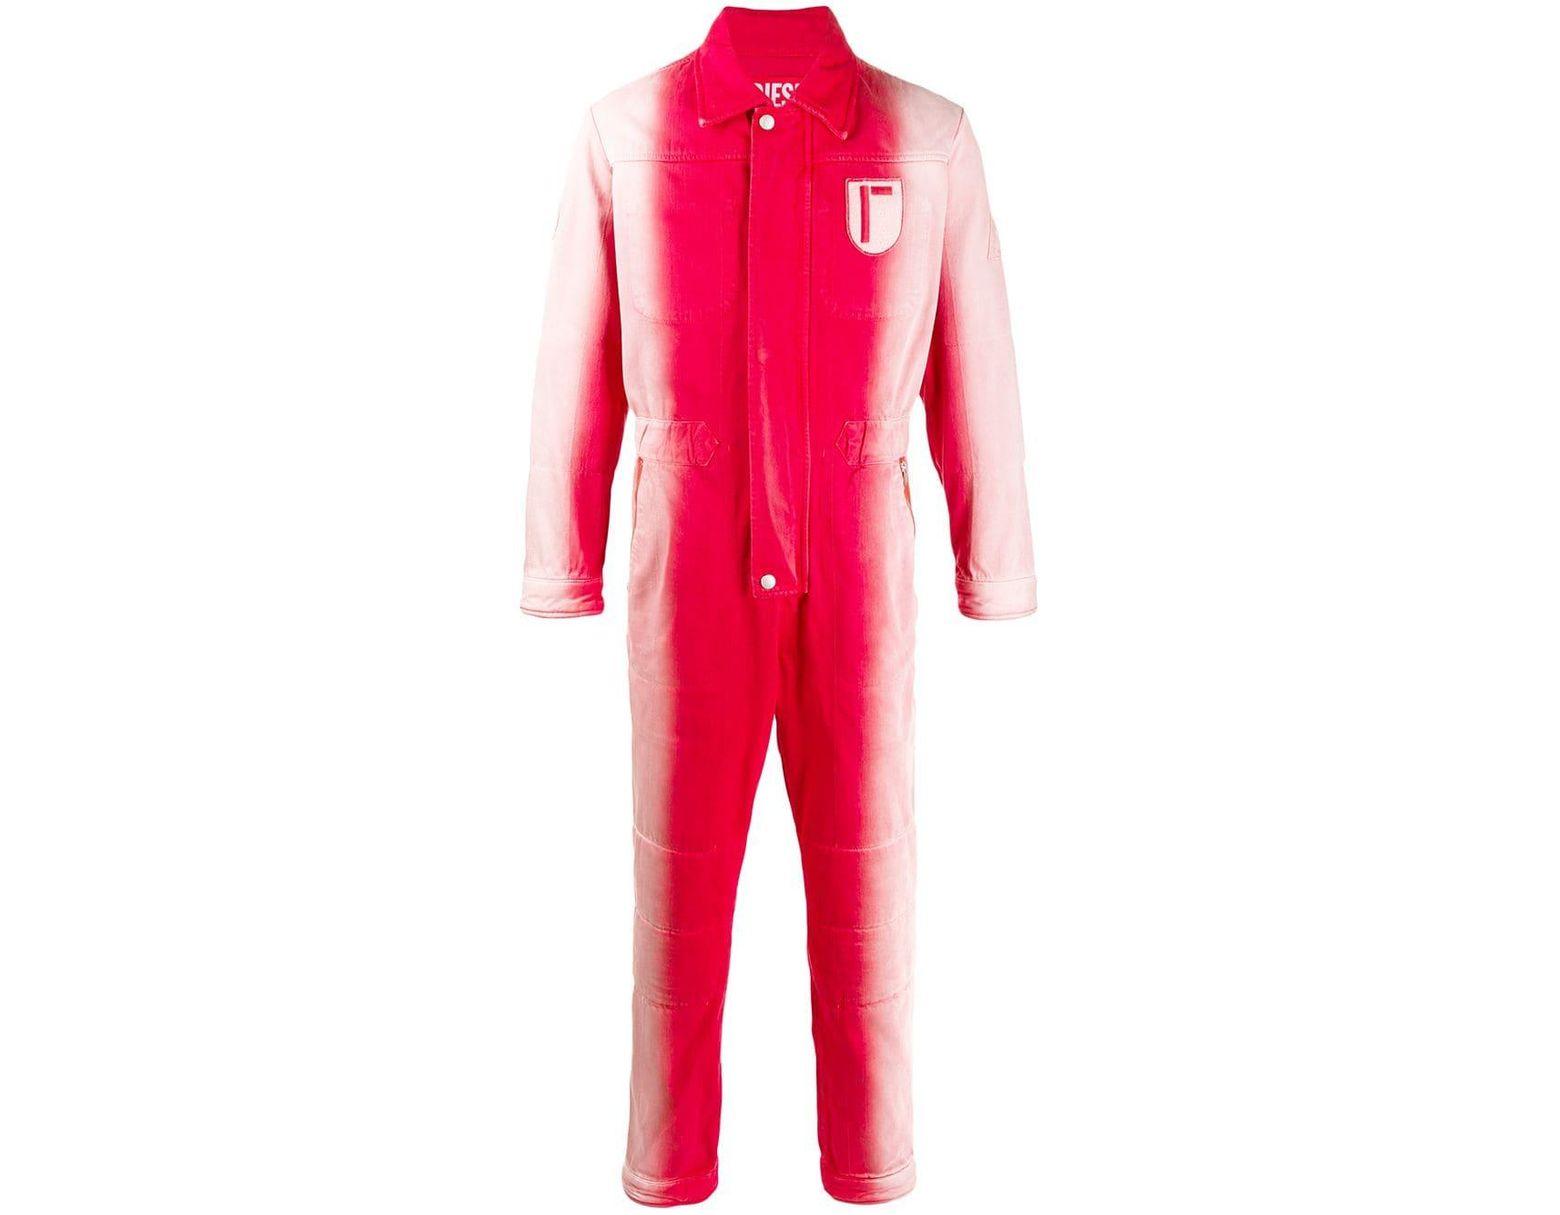 Men's Red Tie-dye Jumpsuit